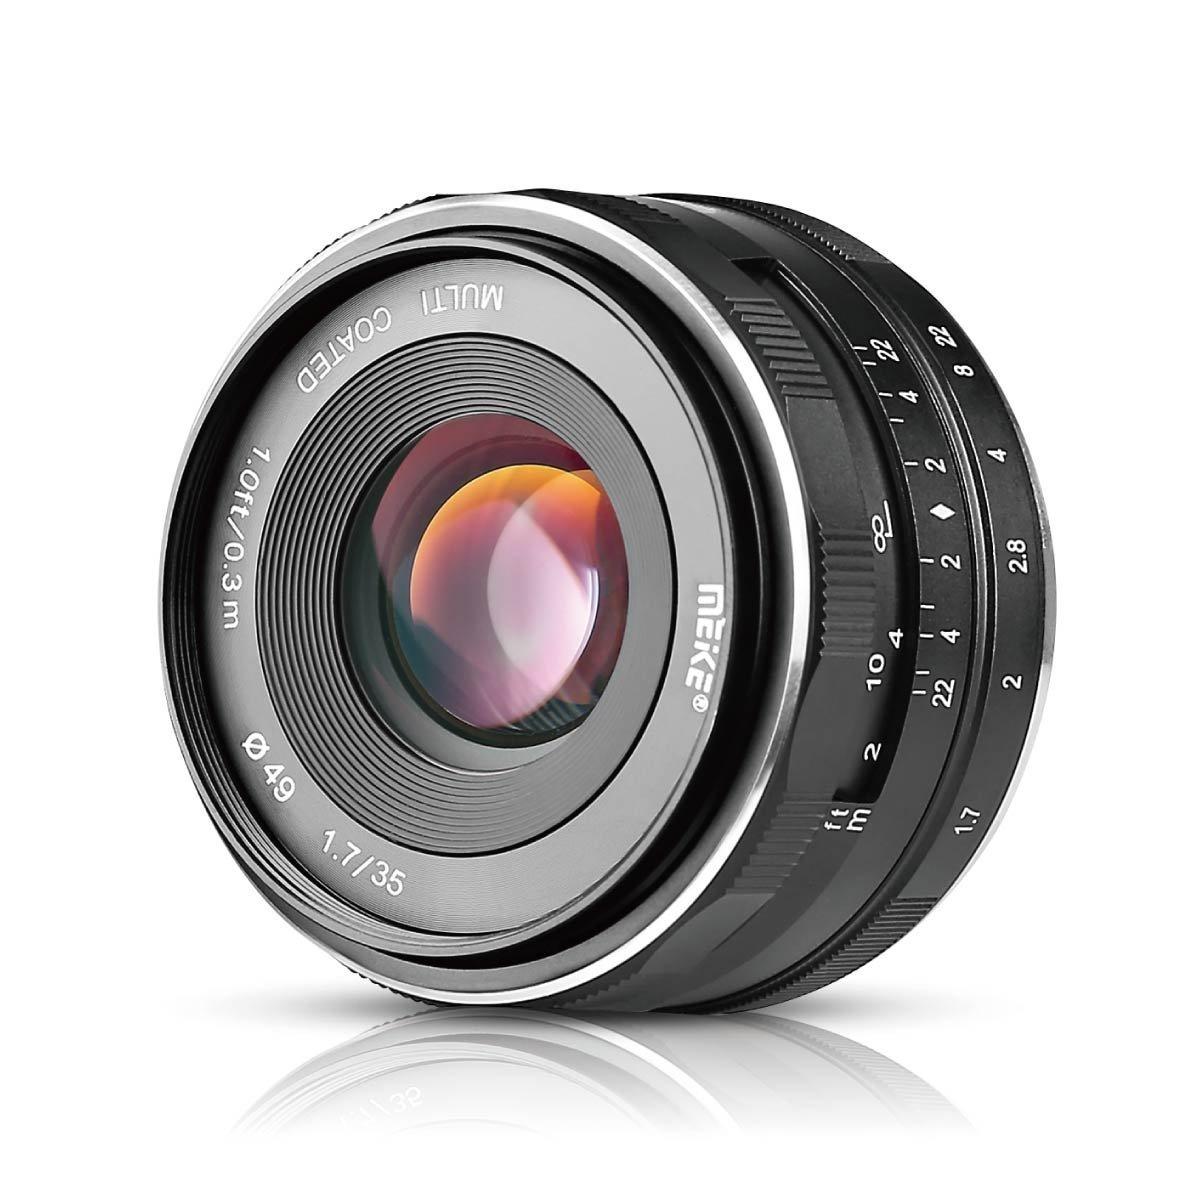 Meike 35mm F1.7 Large Aperture Manual Focus Fixed Lens for Canon EF-M EOS M1 M2 M3 M5 M6 M10 M100